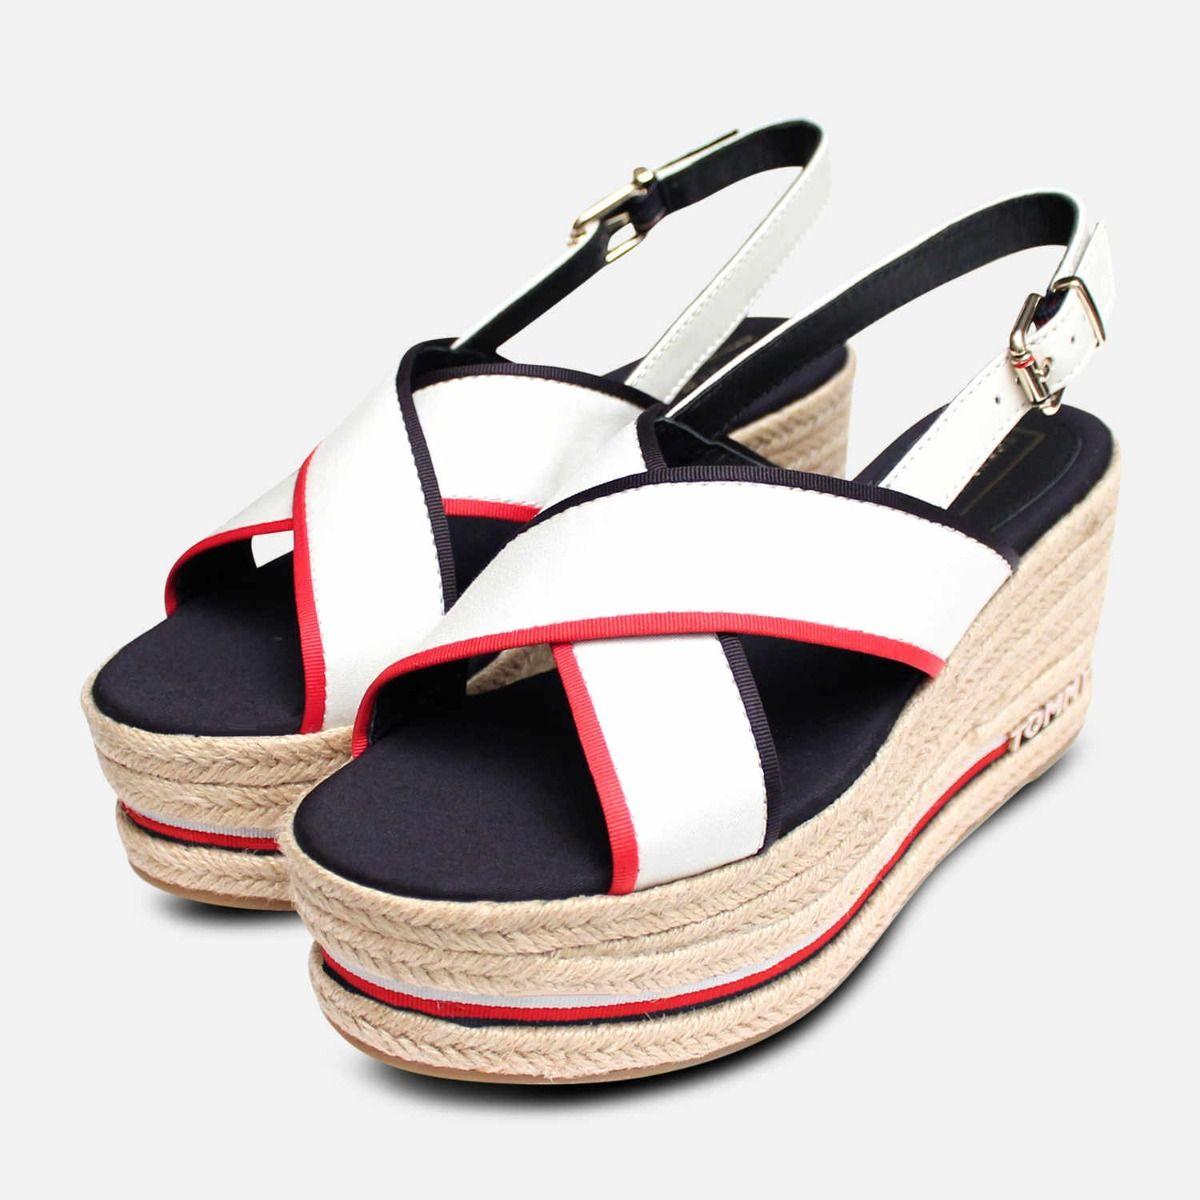 fc55ae4df6 Tommy Hilfiger Designer Flatform Sandals in Red White & Blue